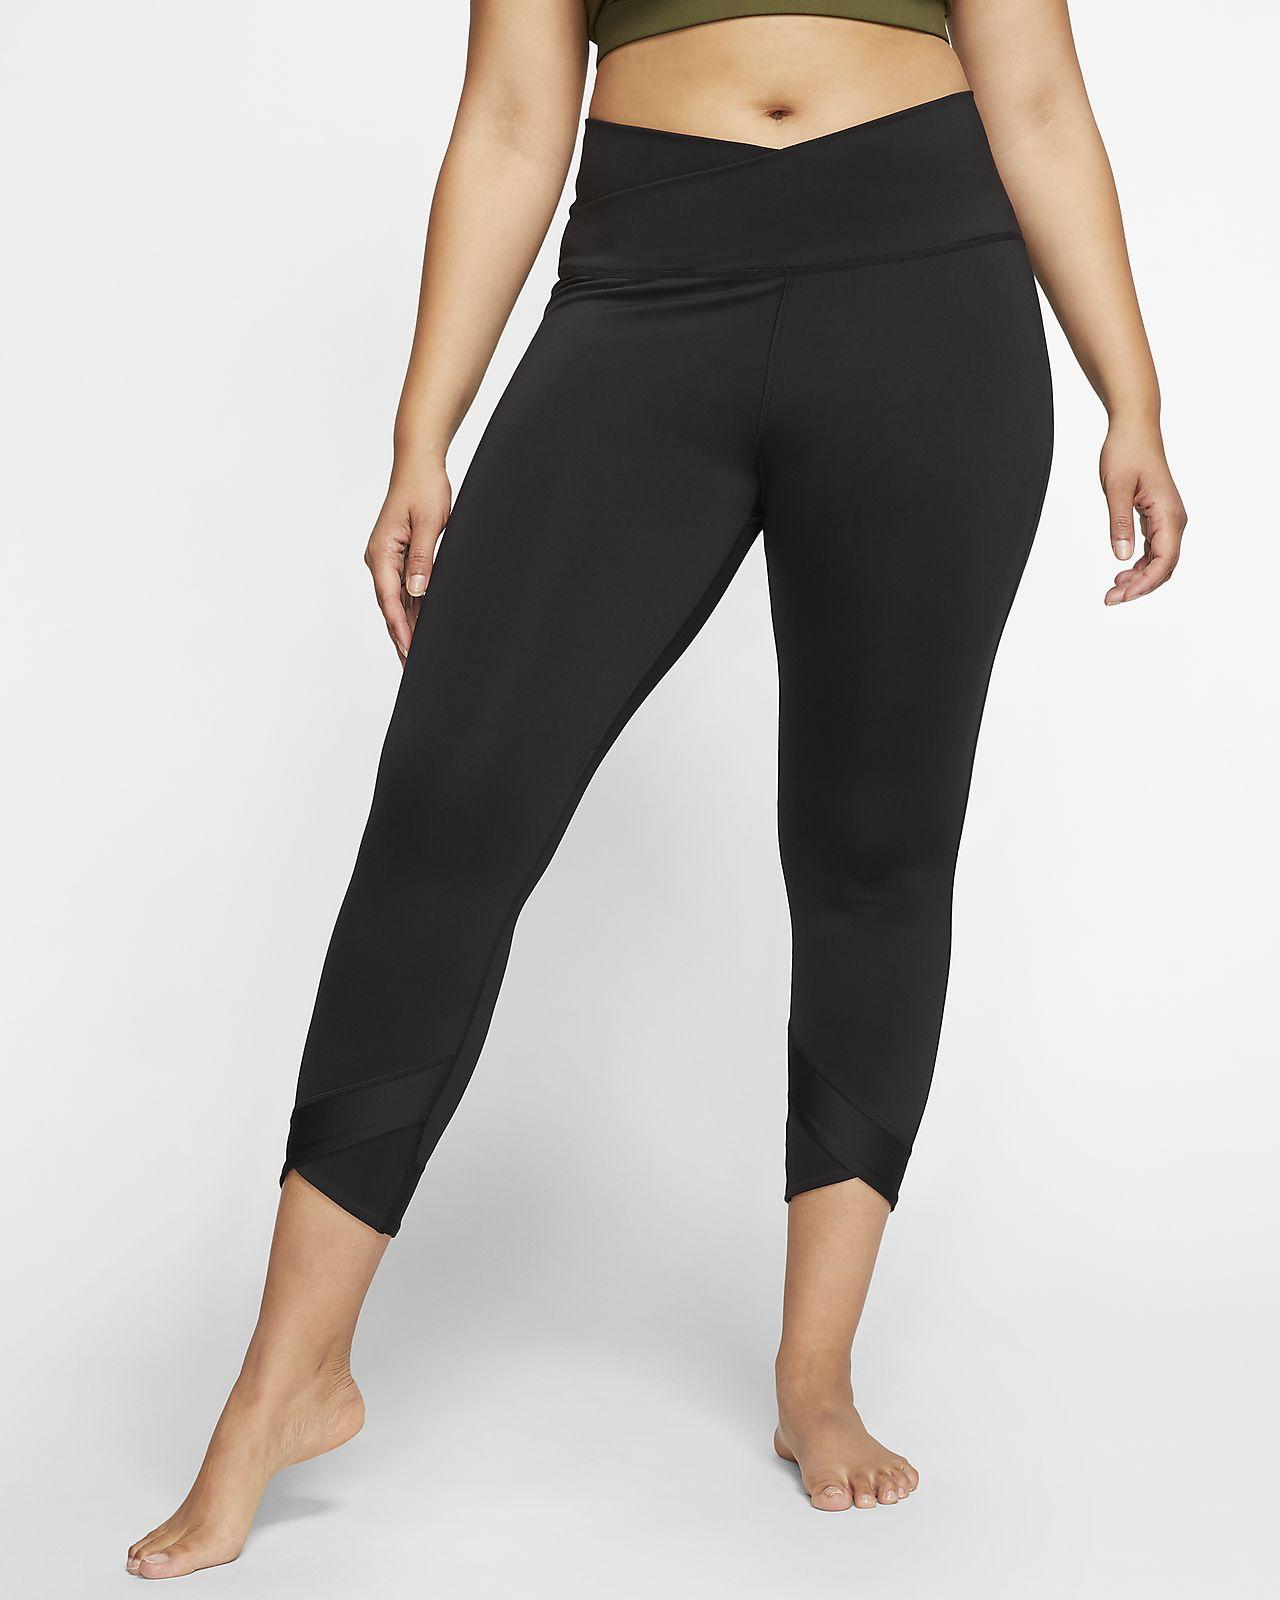 Legging 78 Nike Yoga pour Femme (grande taille)